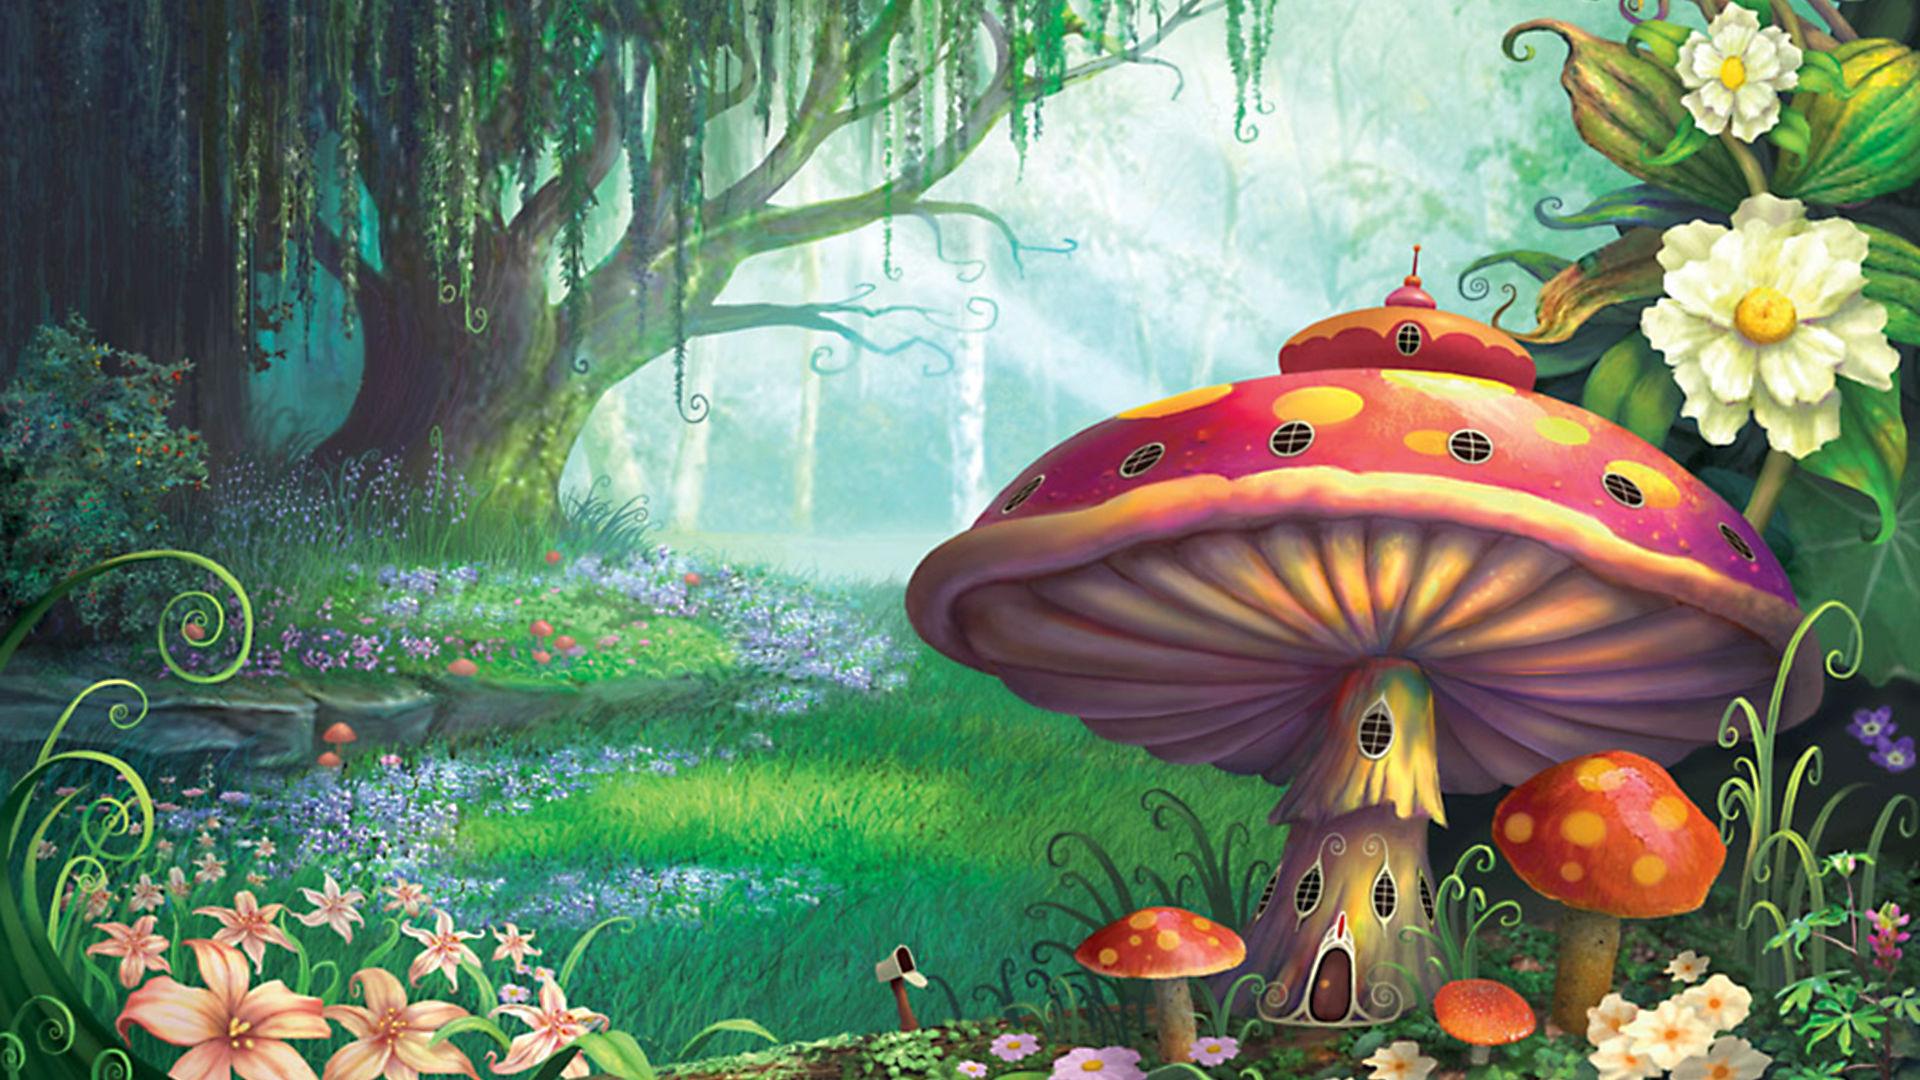 Fantasy - Forest  Wallpaper